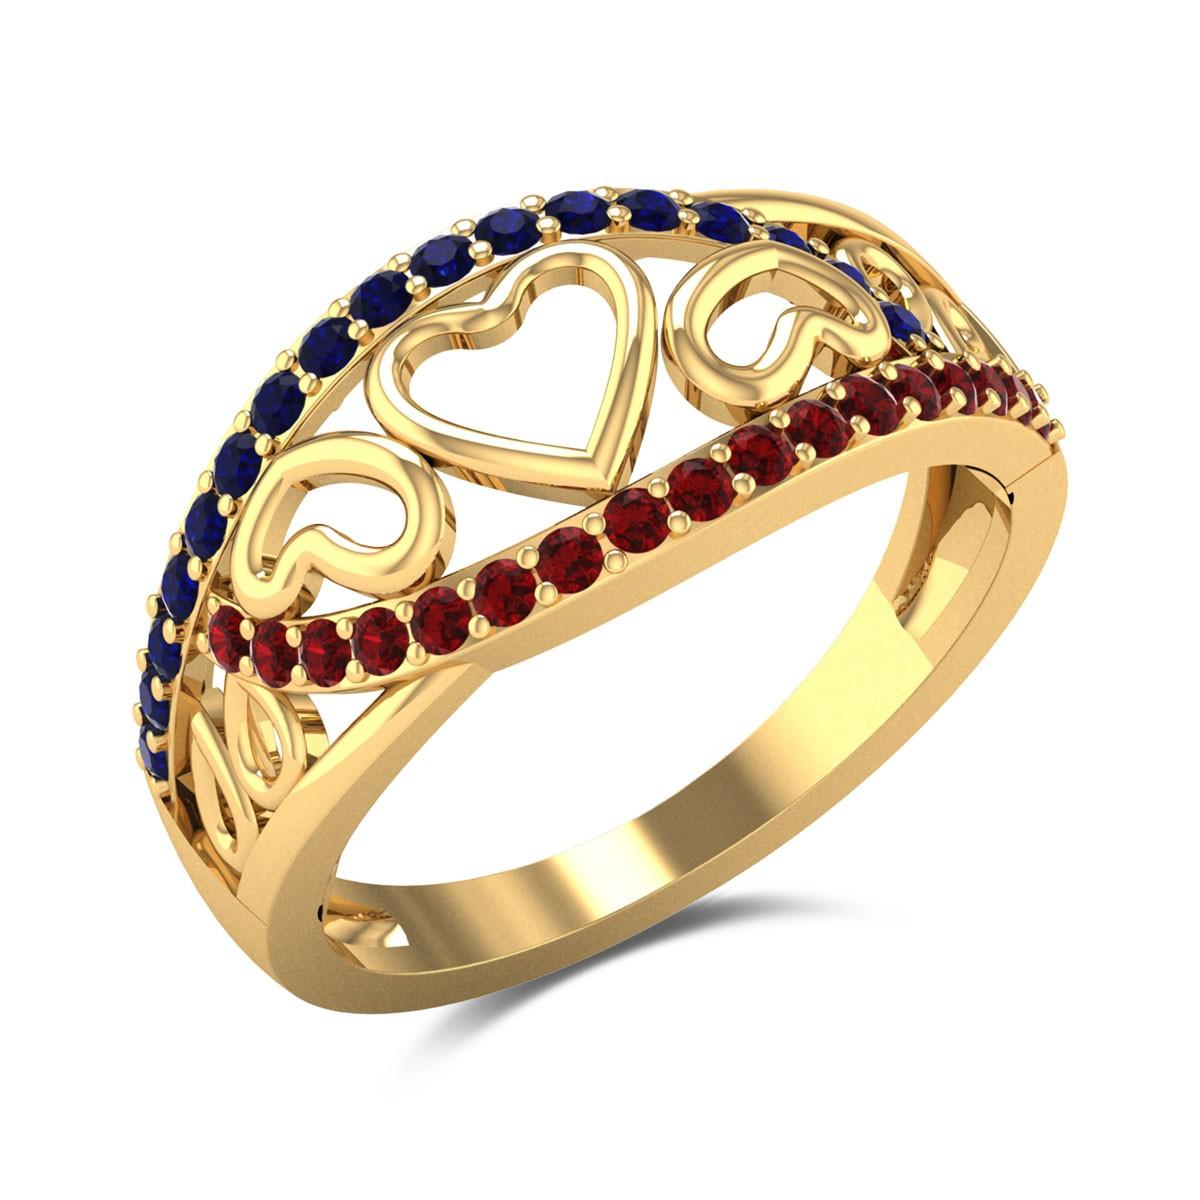 Proteus Heart Ring